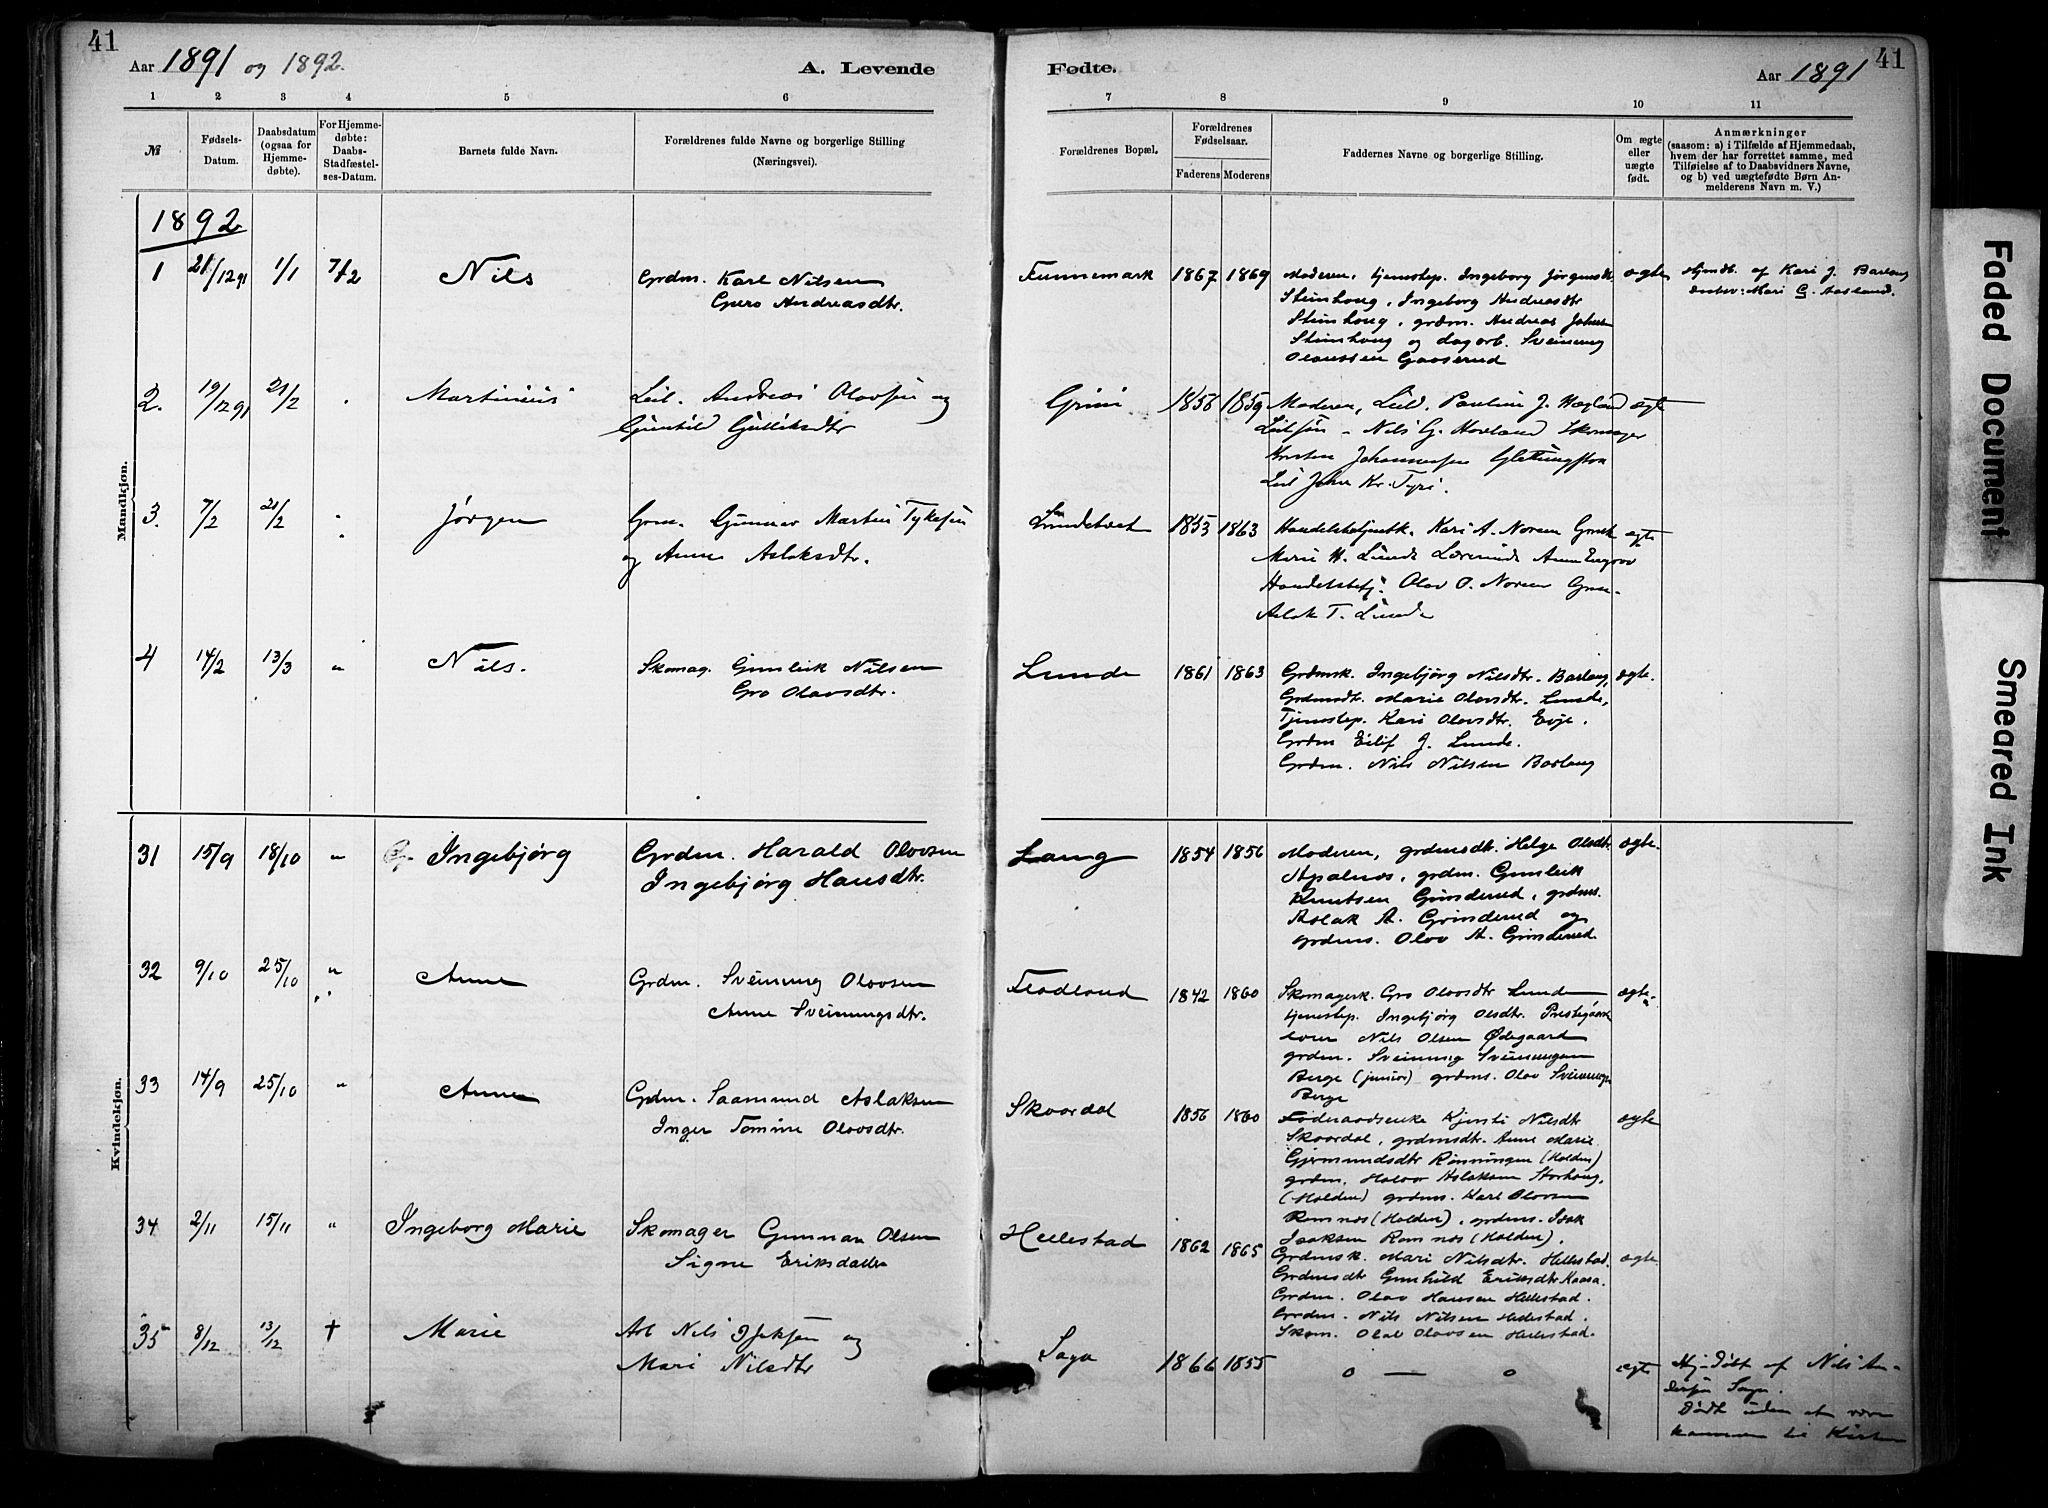 SAKO, Lunde kirkebøker, F/Fa/L0002: Ministerialbok nr. I 2, 1884-1892, s. 41